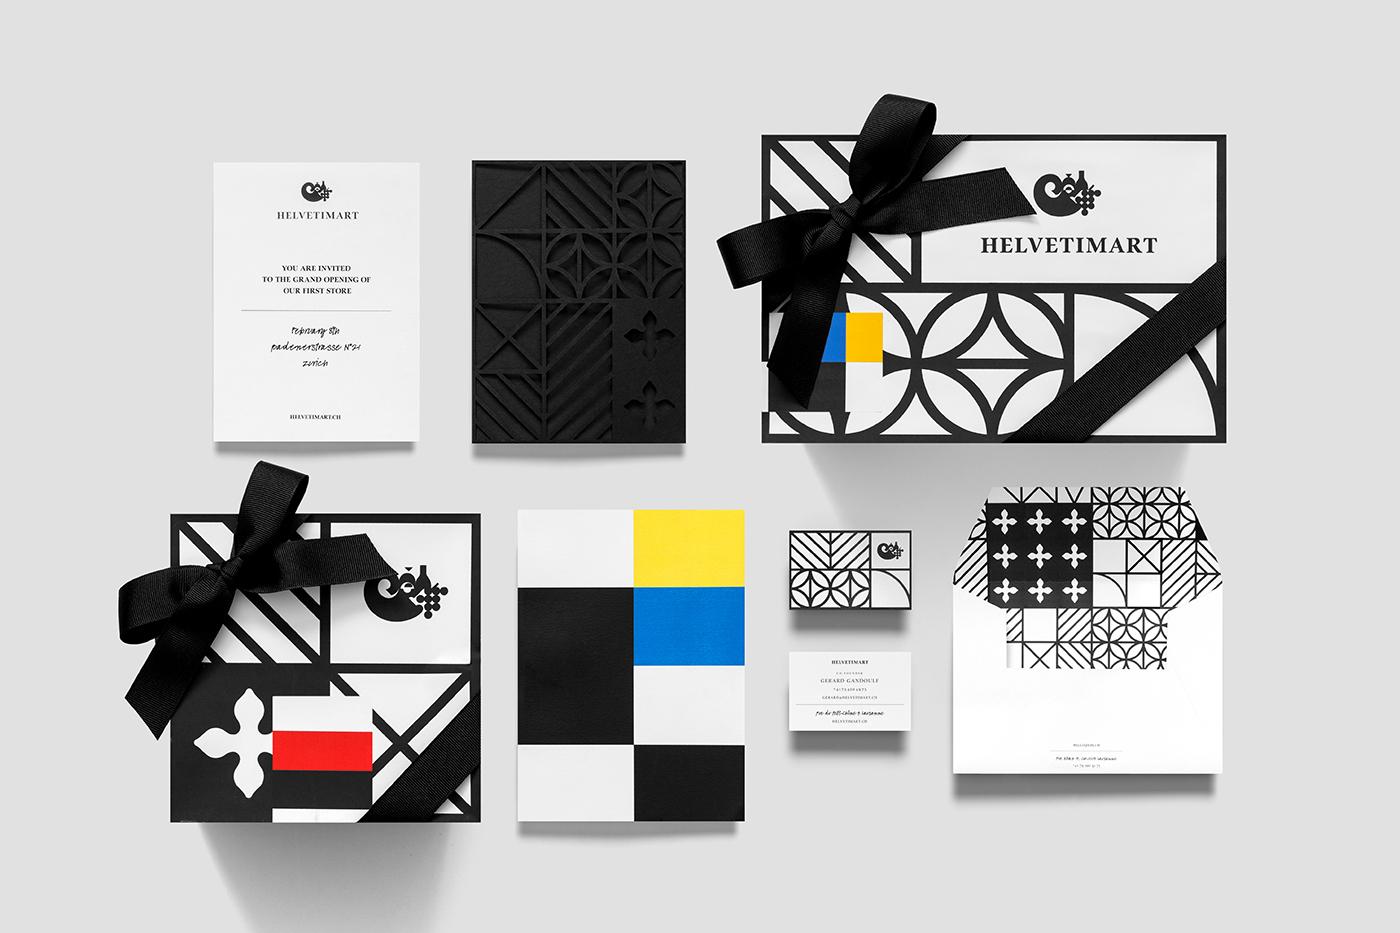 02-Helvetimart-Switzerland-Branding-Packaging-Stationery-Anagrama-Mexico-BPO